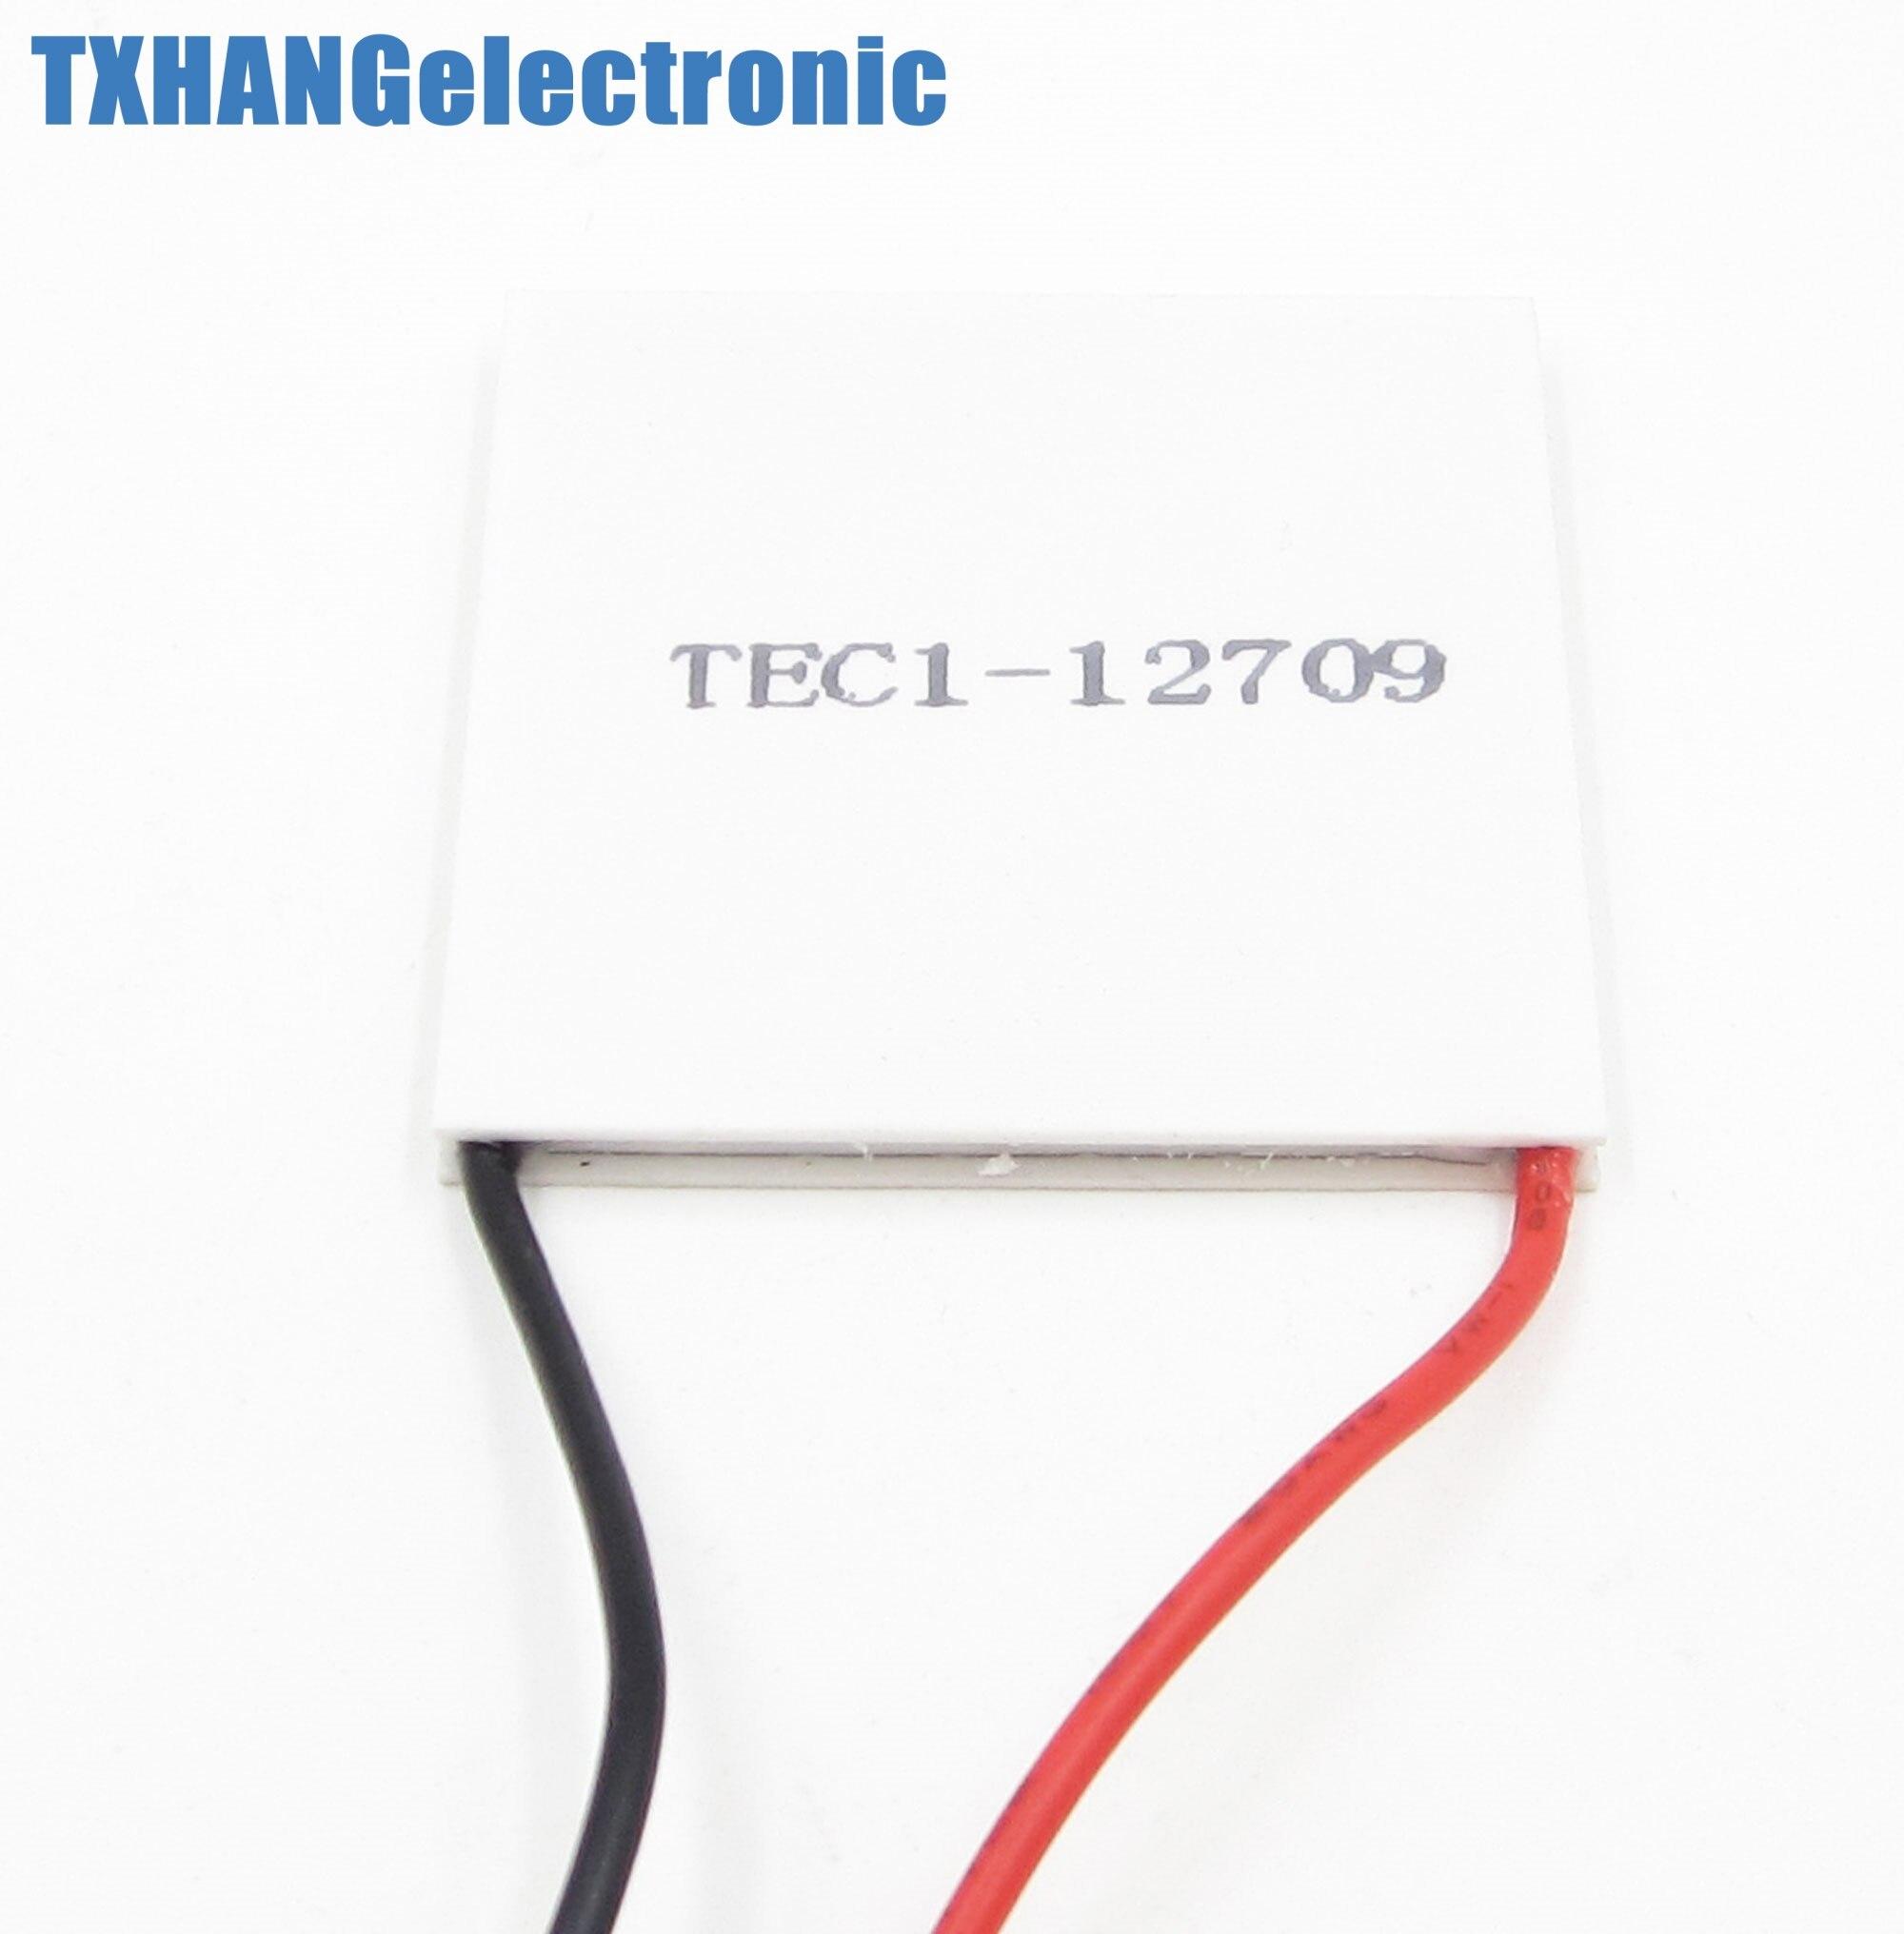 10PCS TEC1-12709 Heatsink Thermoelectric Cooler Cooling Peltier Plate Module10PCS TEC1-12709 Heatsink Thermoelectric Cooler Cooling Peltier Plate Module